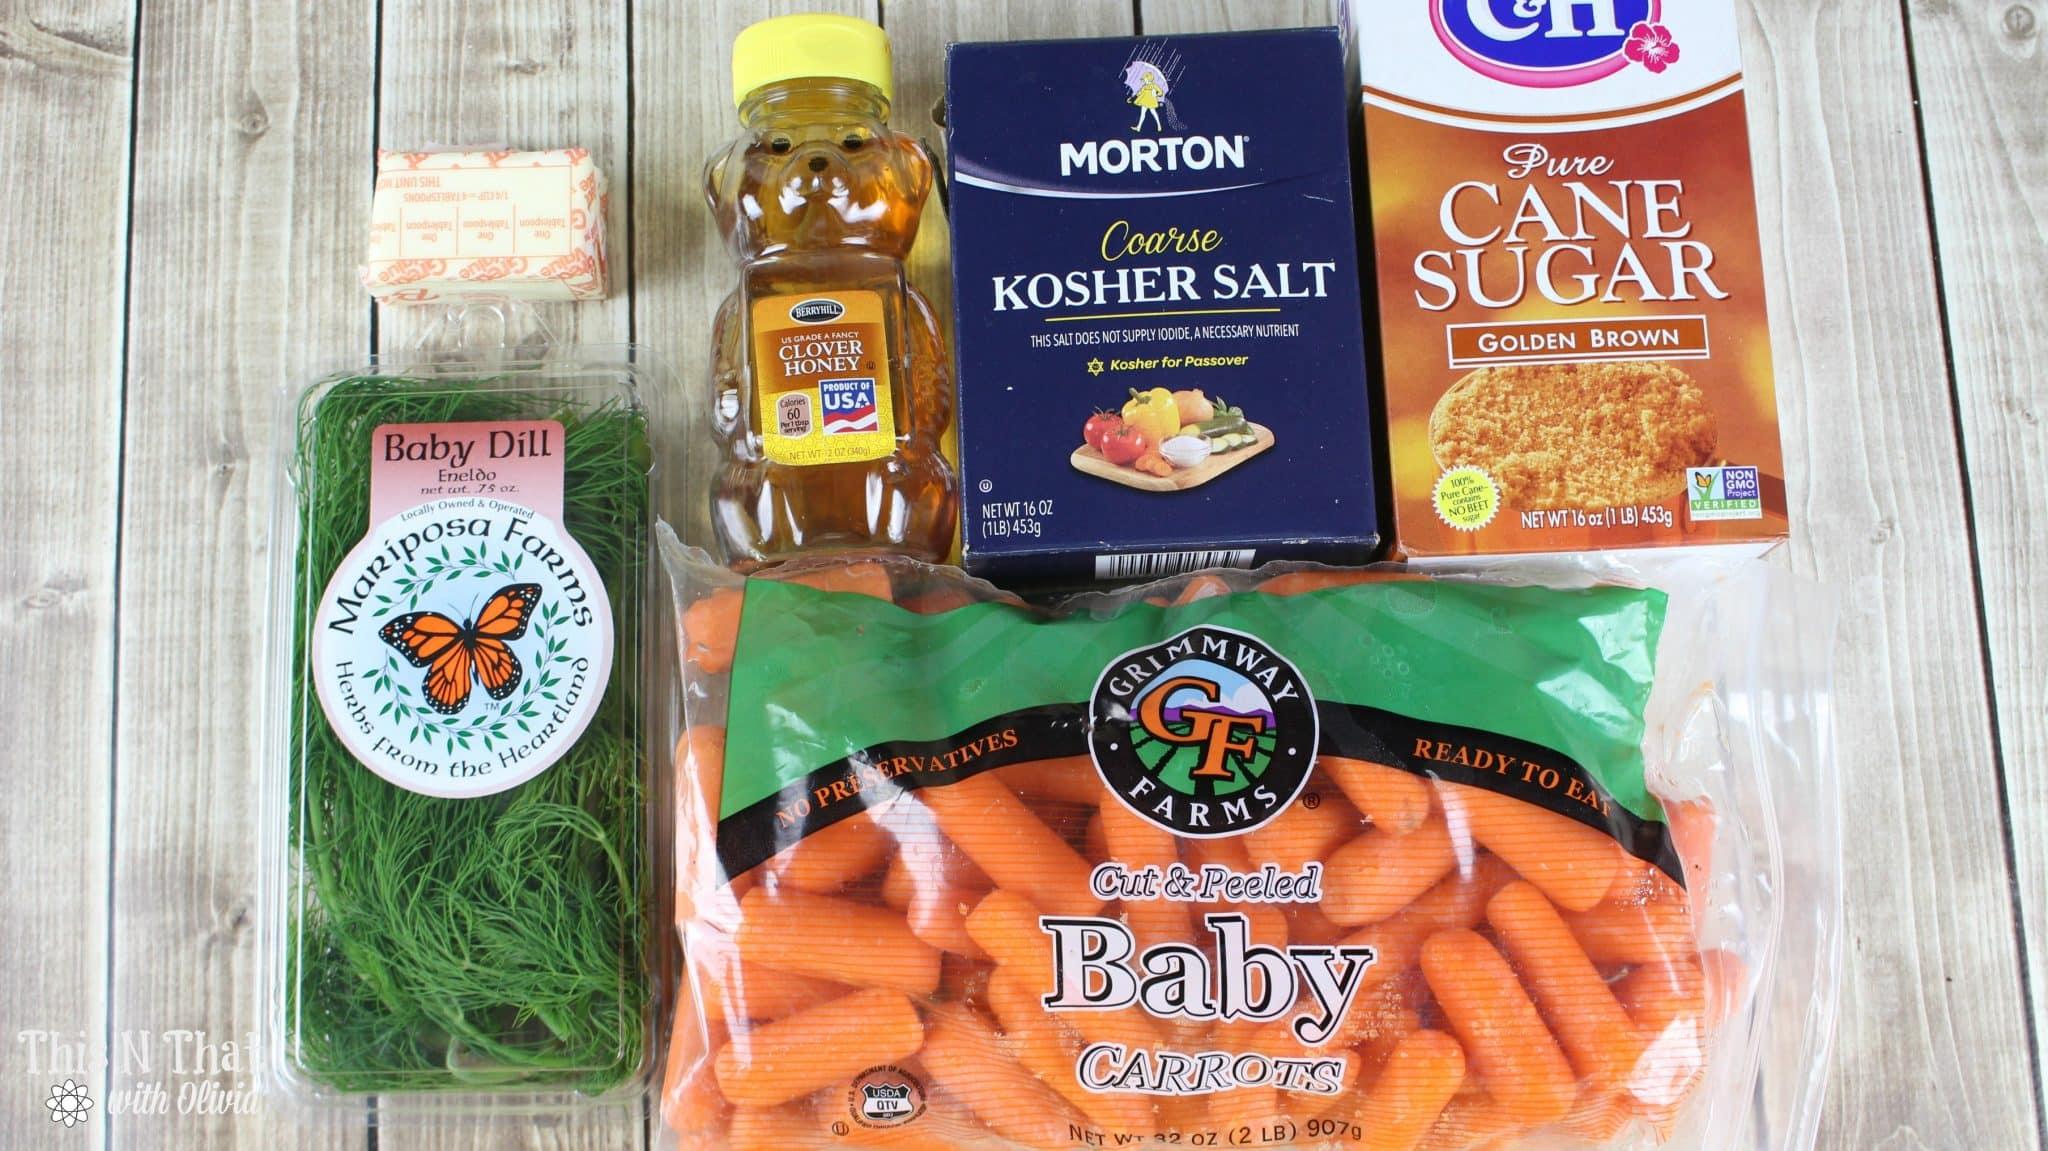 Honey and Brown Sugar Glazed Crockpot Carrots